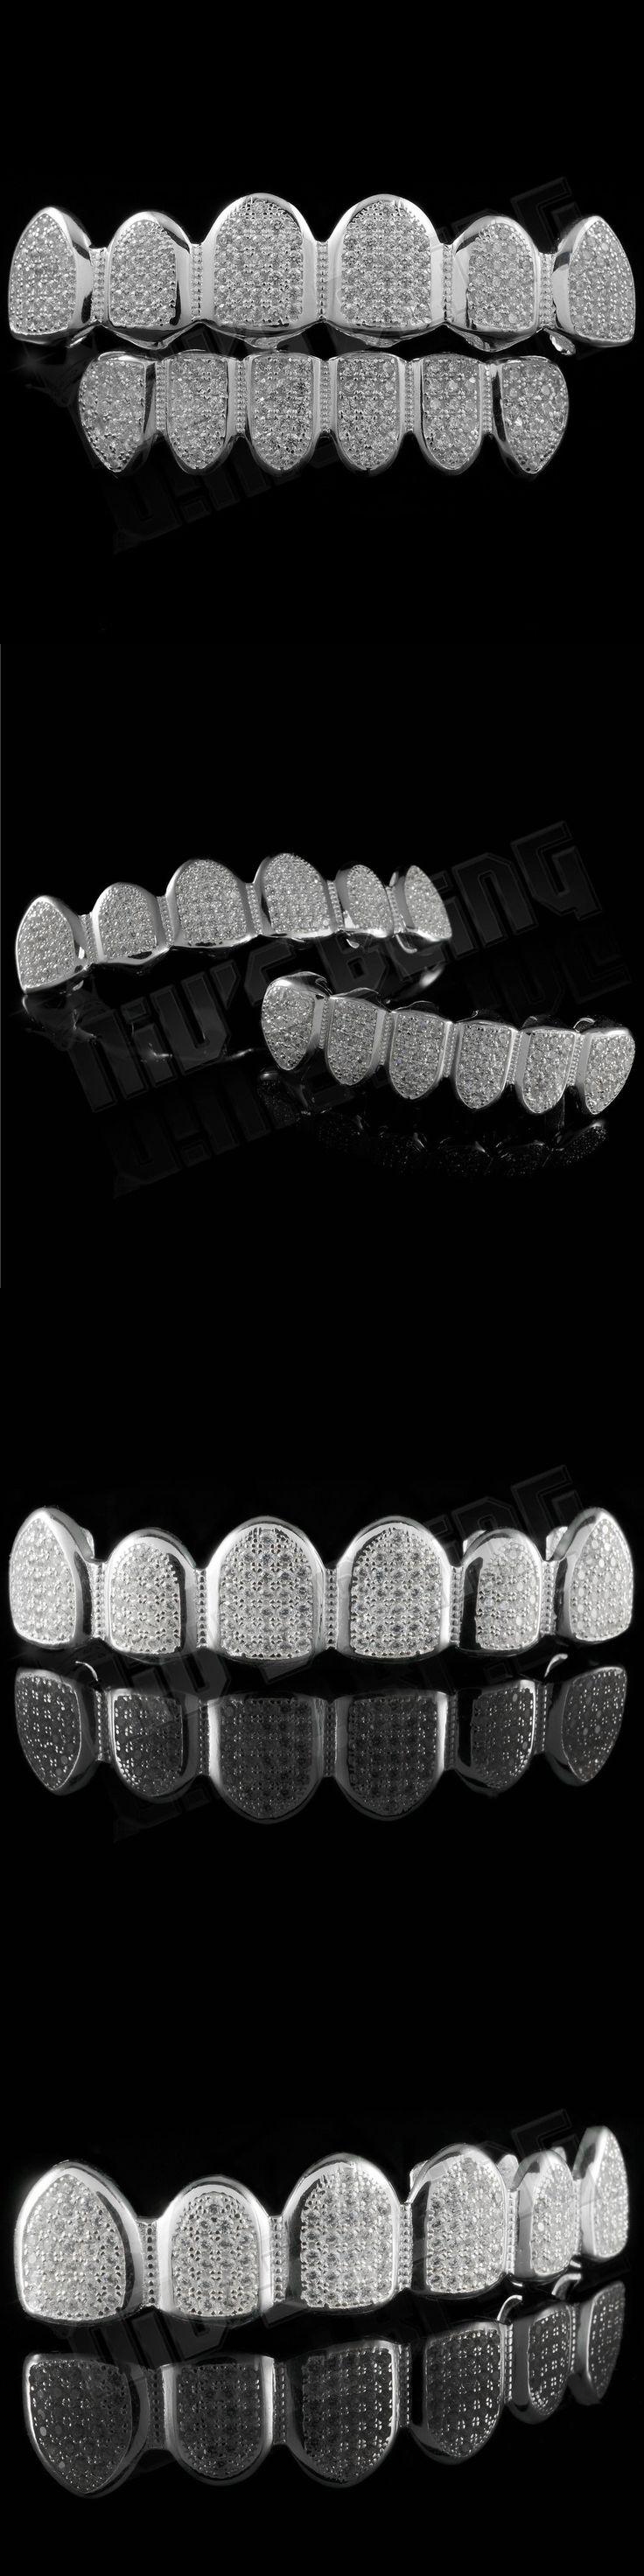 Grillz Dental Grills 152808: .925 Sterling Silver Cz Micro Pave Top Bottom Custom Grillz Set Joker Teeth BUY IT NOW ONLY: $59.99